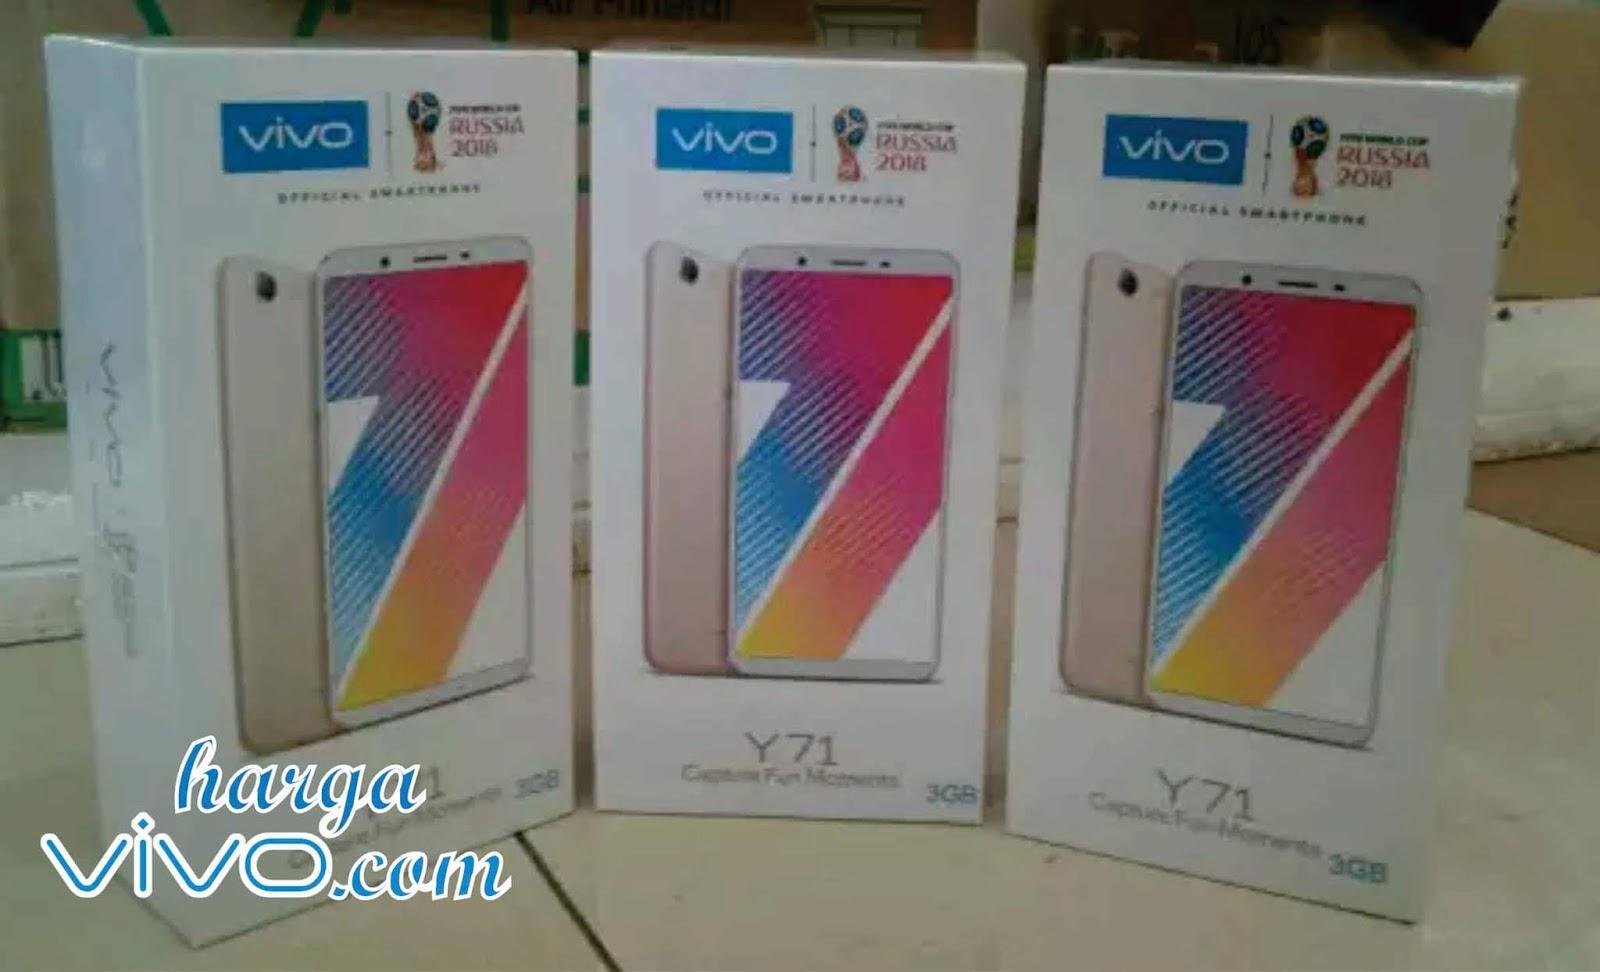 Harga Hp Vivo Y71 Terbaru 16 32gb Dan Ram 4 Gb